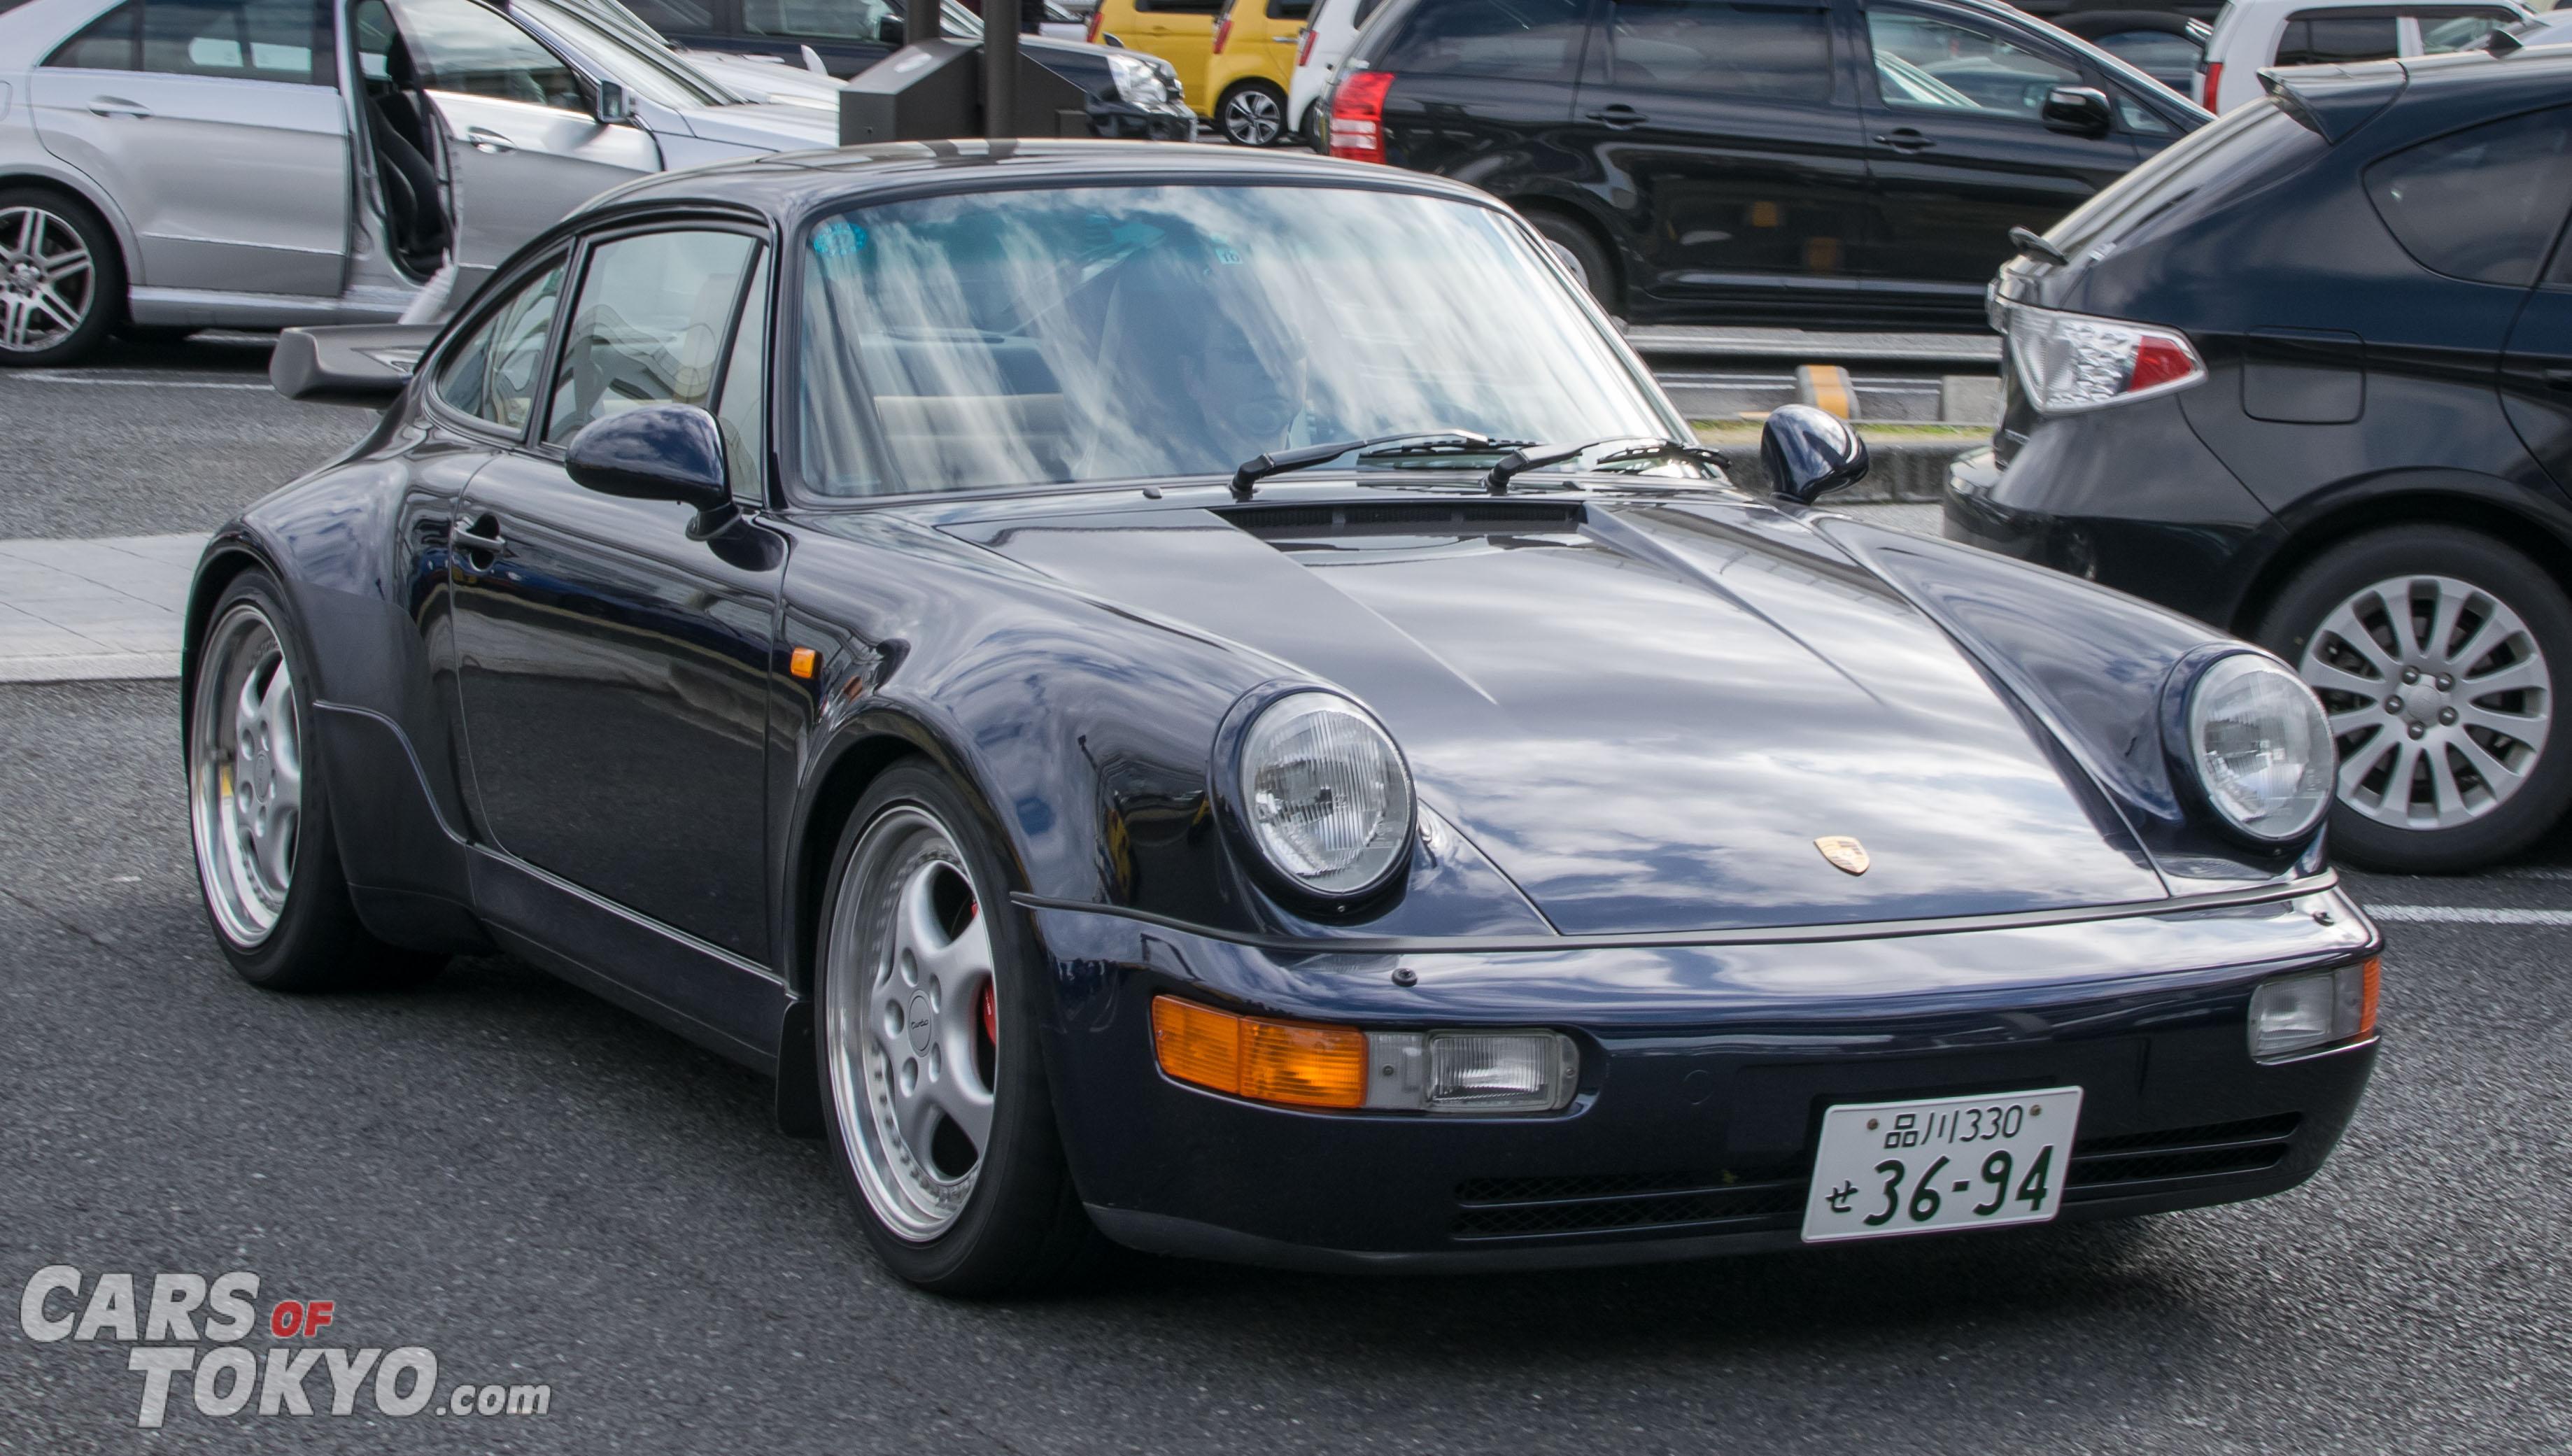 Cars of Tokyo Classic Porsche 911 Turbo